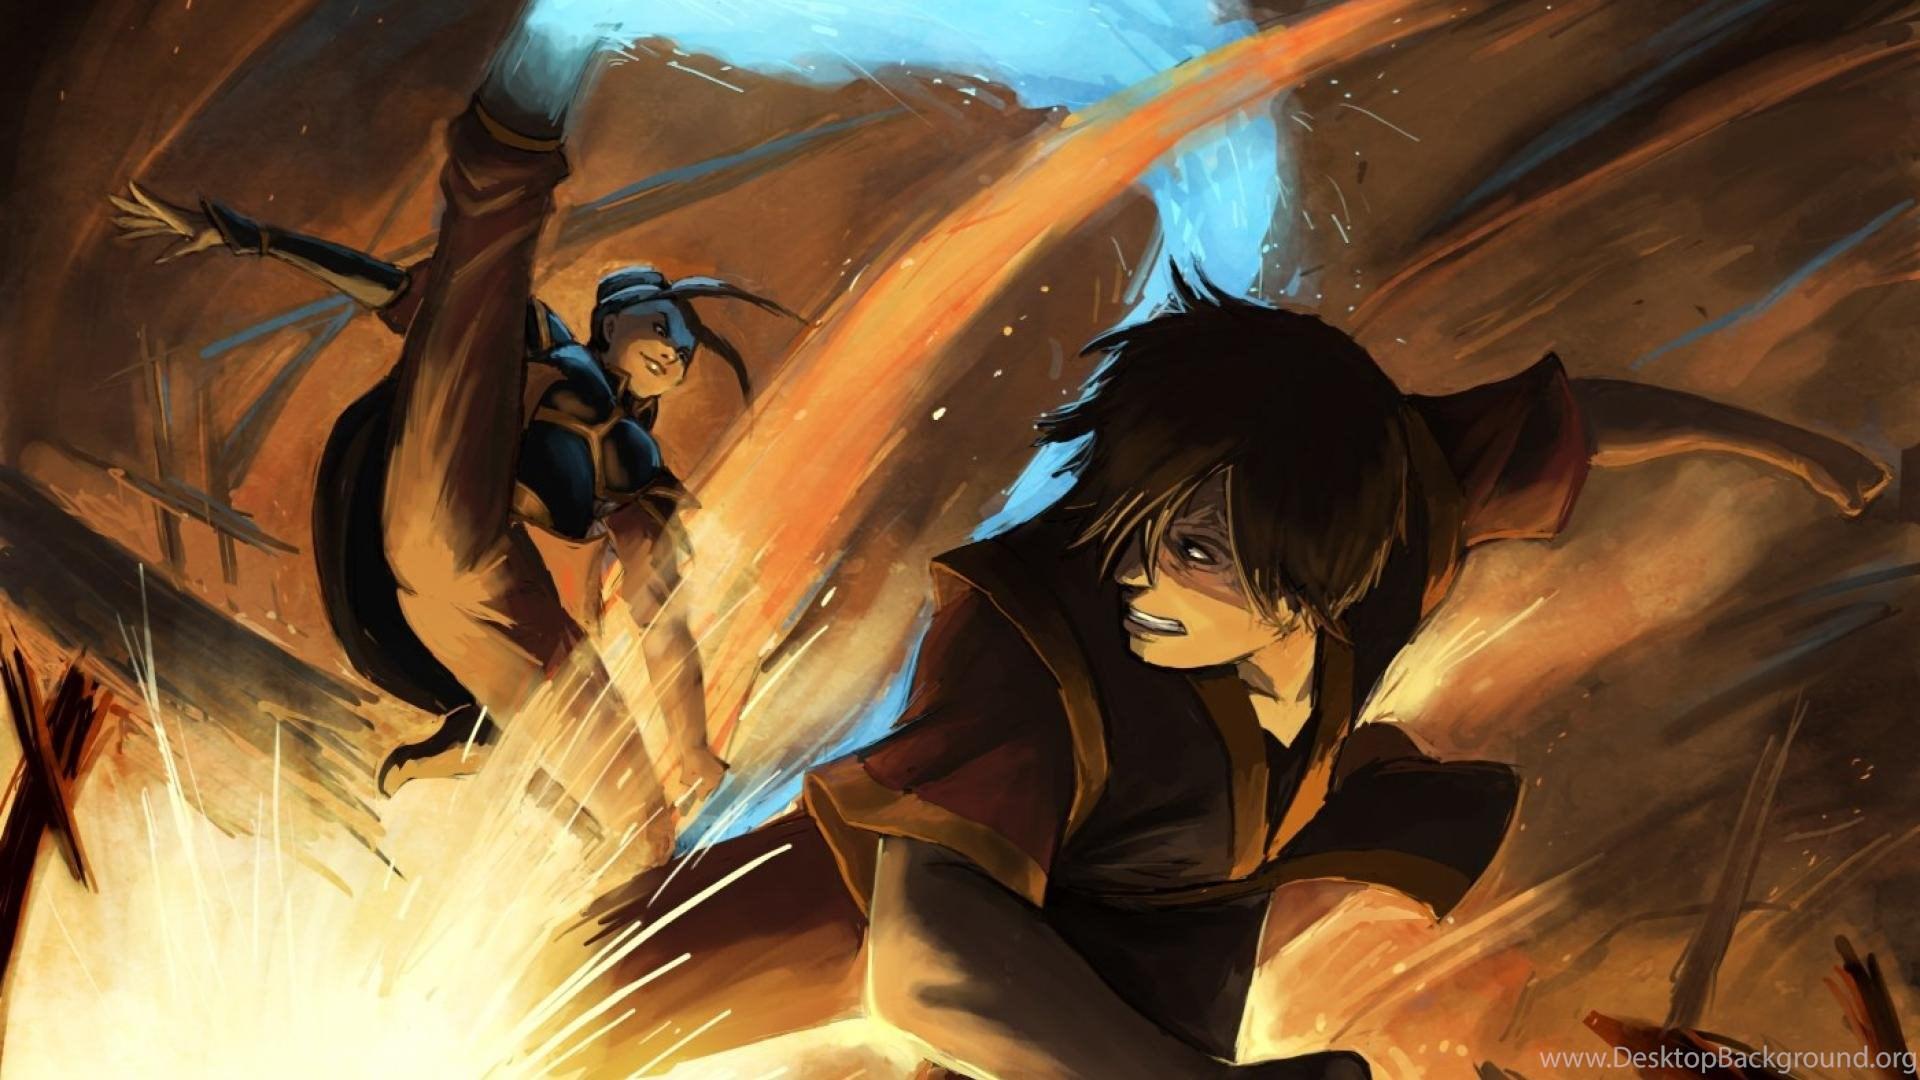 Avatar The Last Airbender Wallpapers 1400x1000 Desktop Background